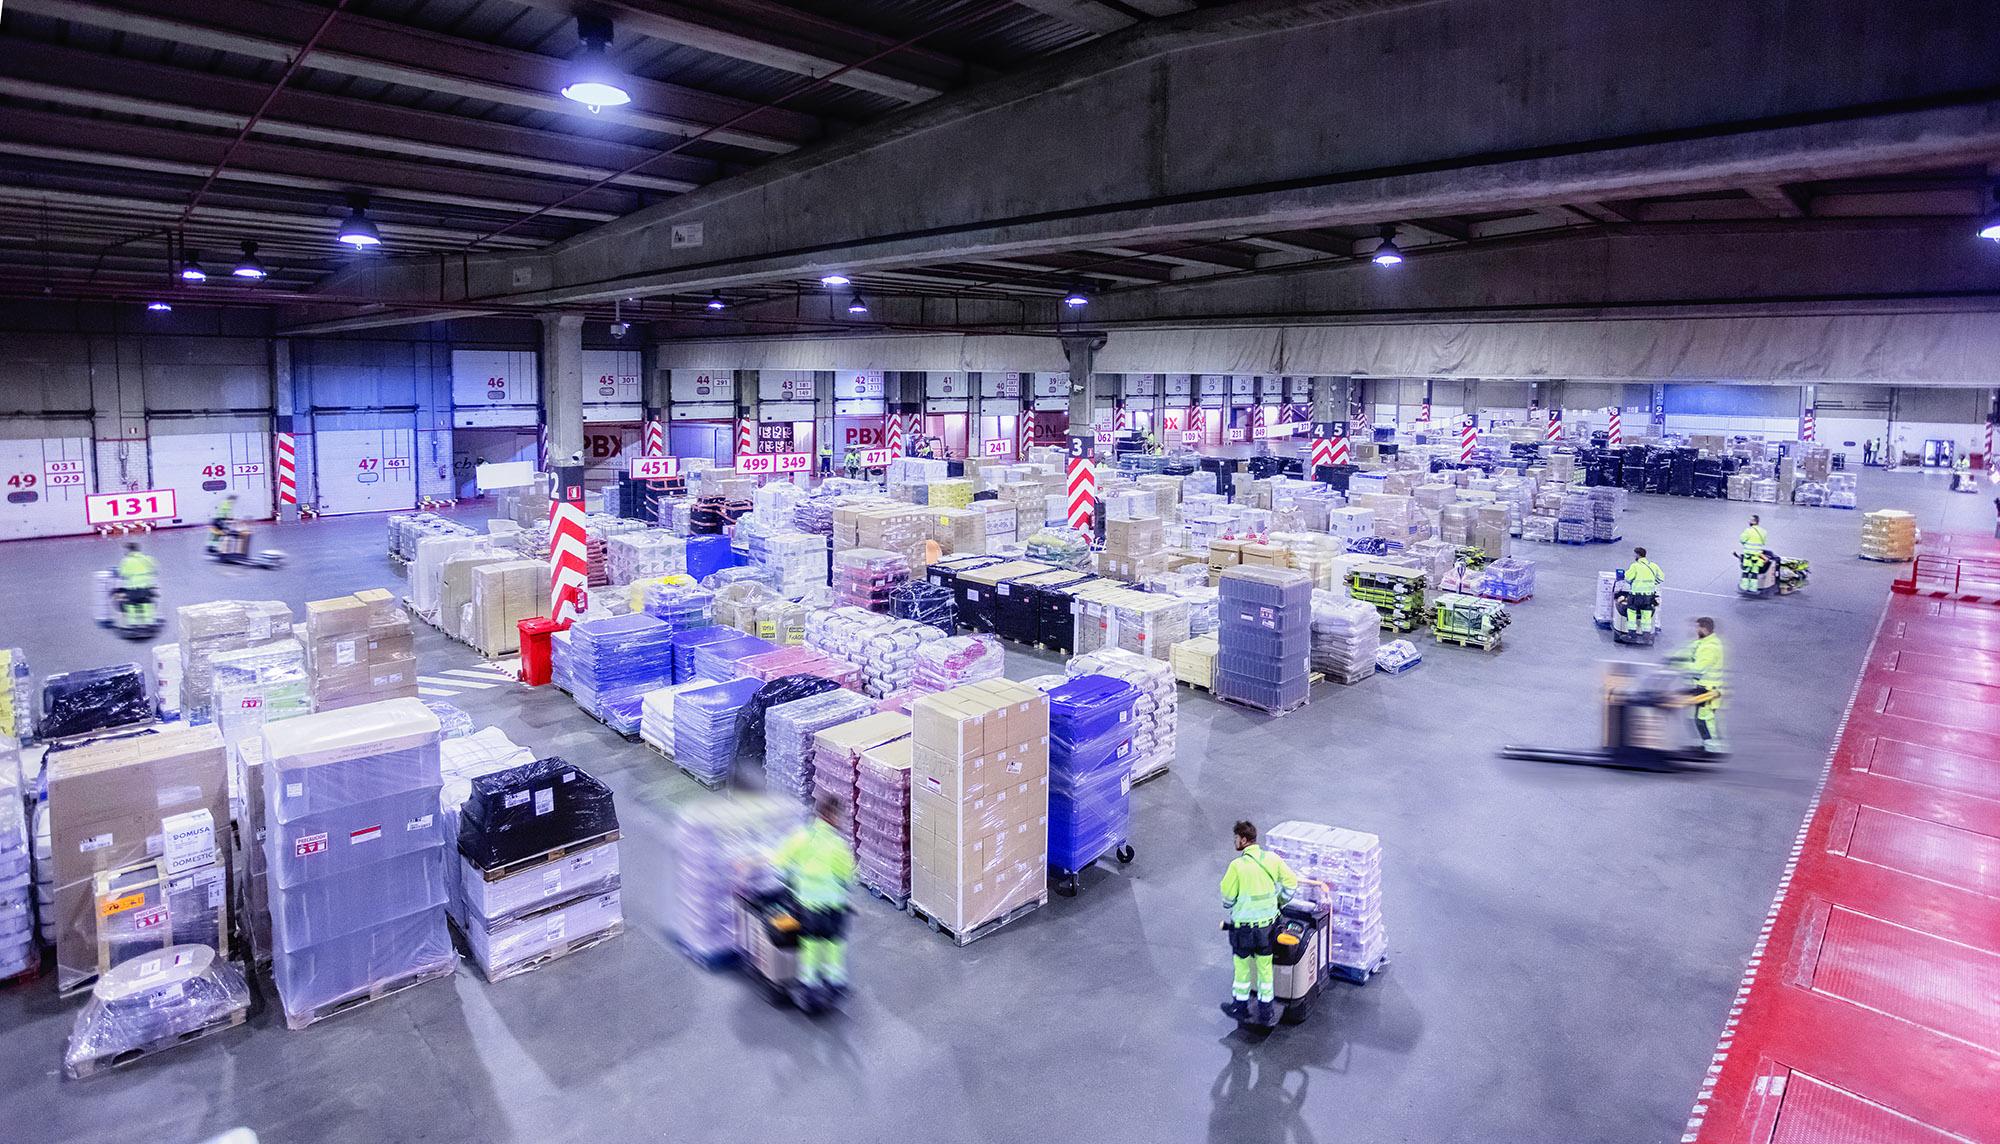 Palibex - PBX -Transporte urgente mercancia paletizada - Beusual - instalaciones